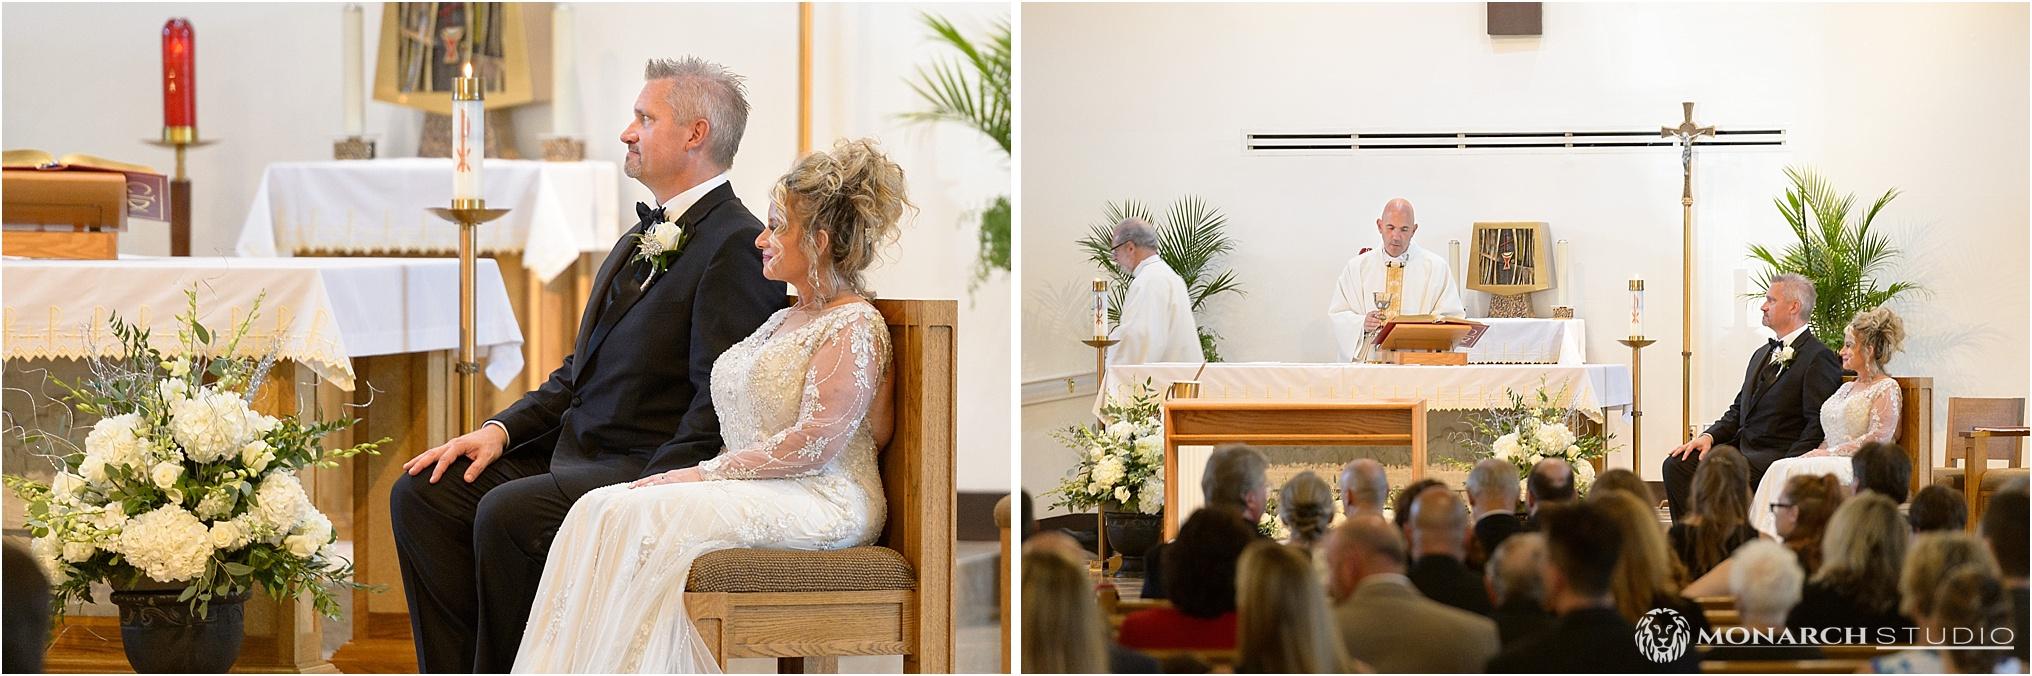 ponte-vedra-wedding-photographer-tpc057.jpg